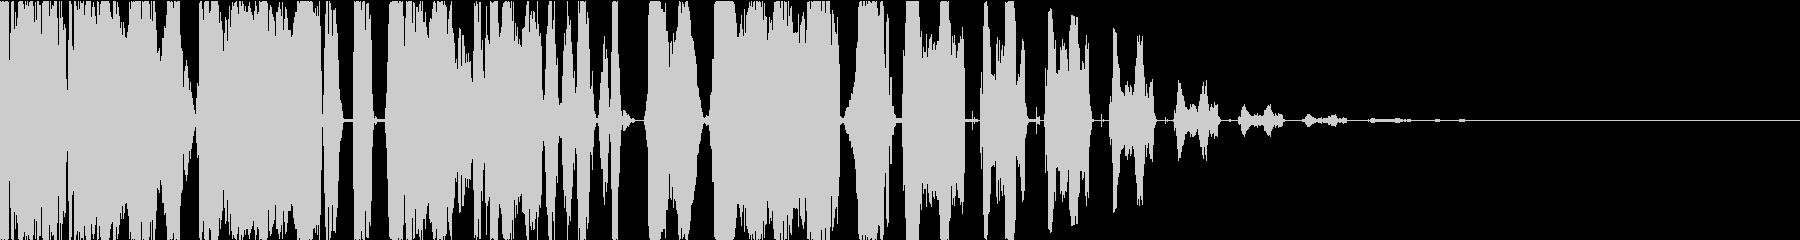 DJスクラッチボーカルチョップジングルbの未再生の波形